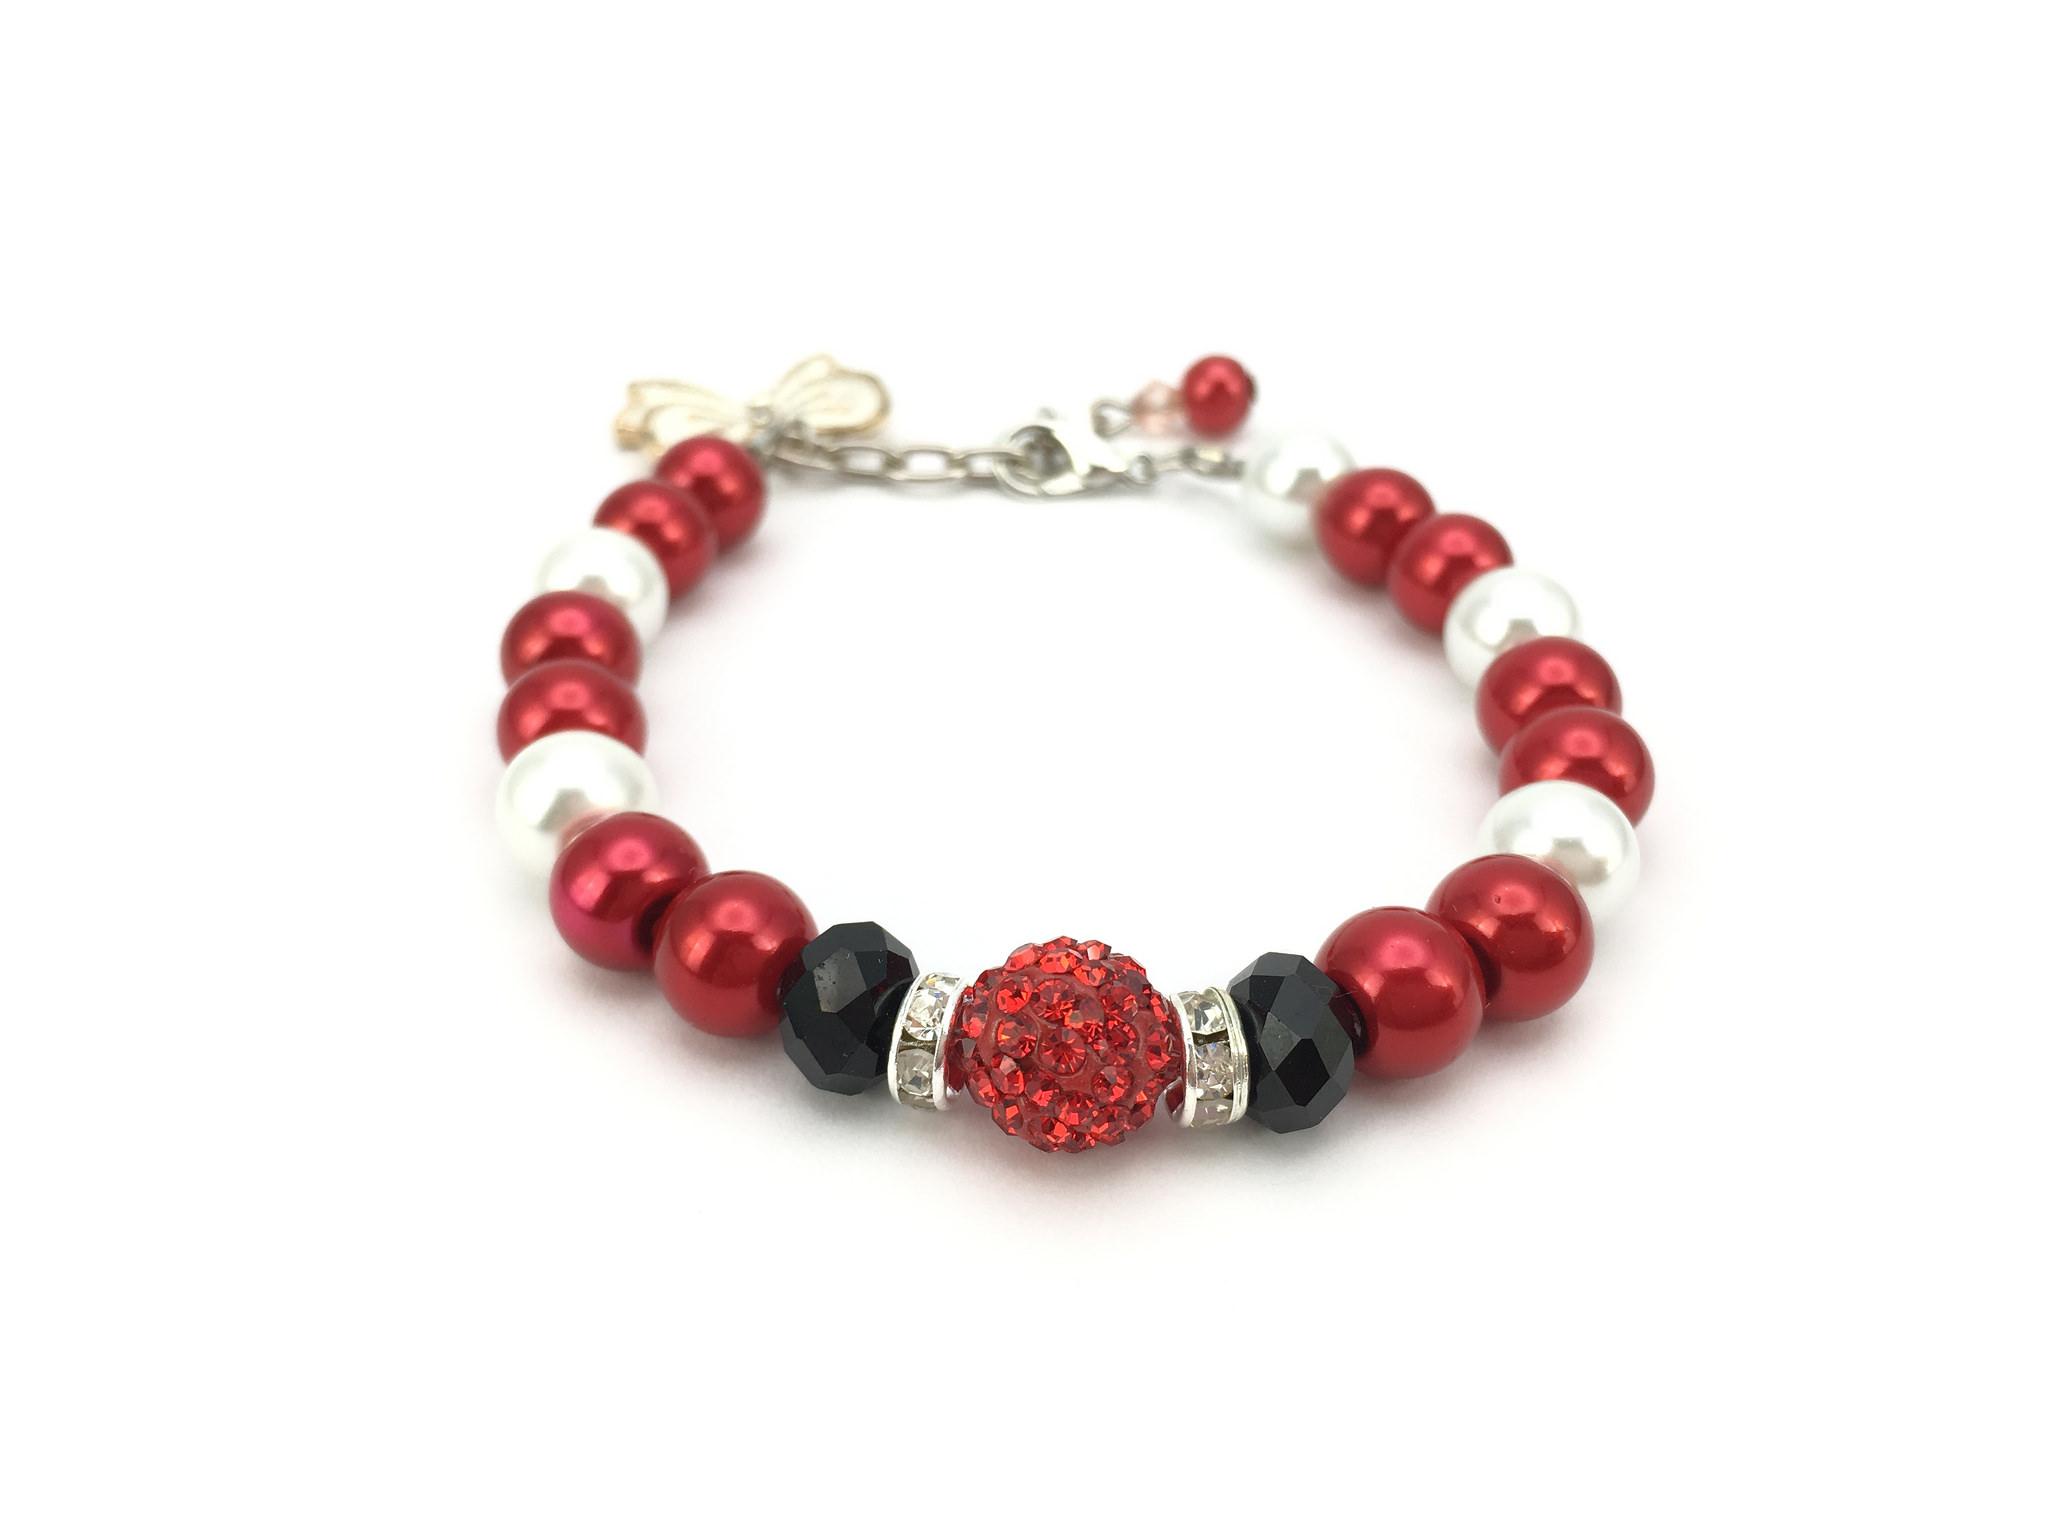 Fiery Red Cherry Bracelet with Ribbon Charm